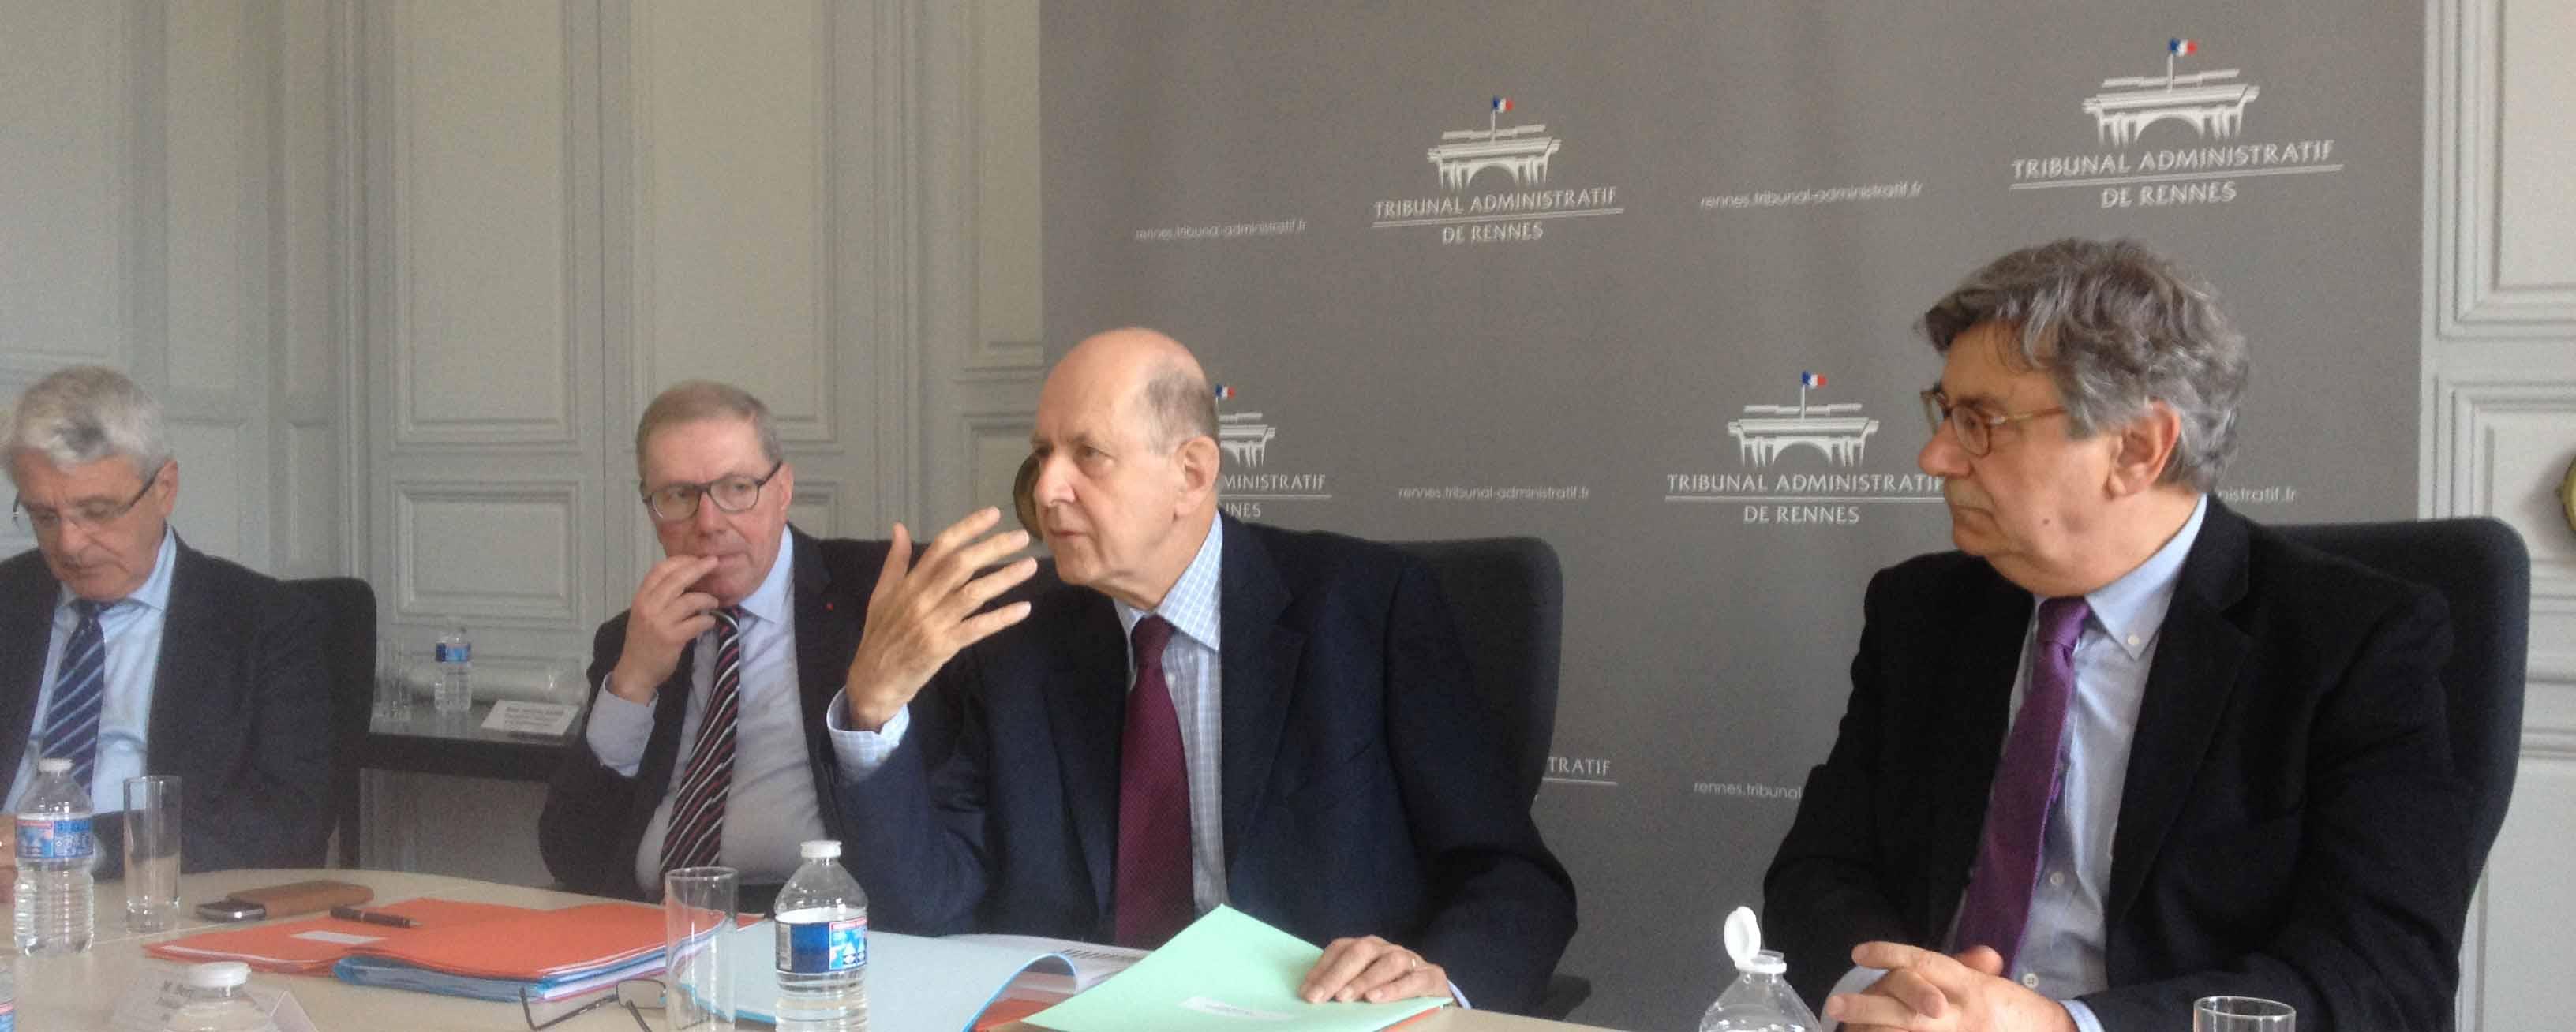 Tribunal administratif Rennes Jean-Marc Sauvé